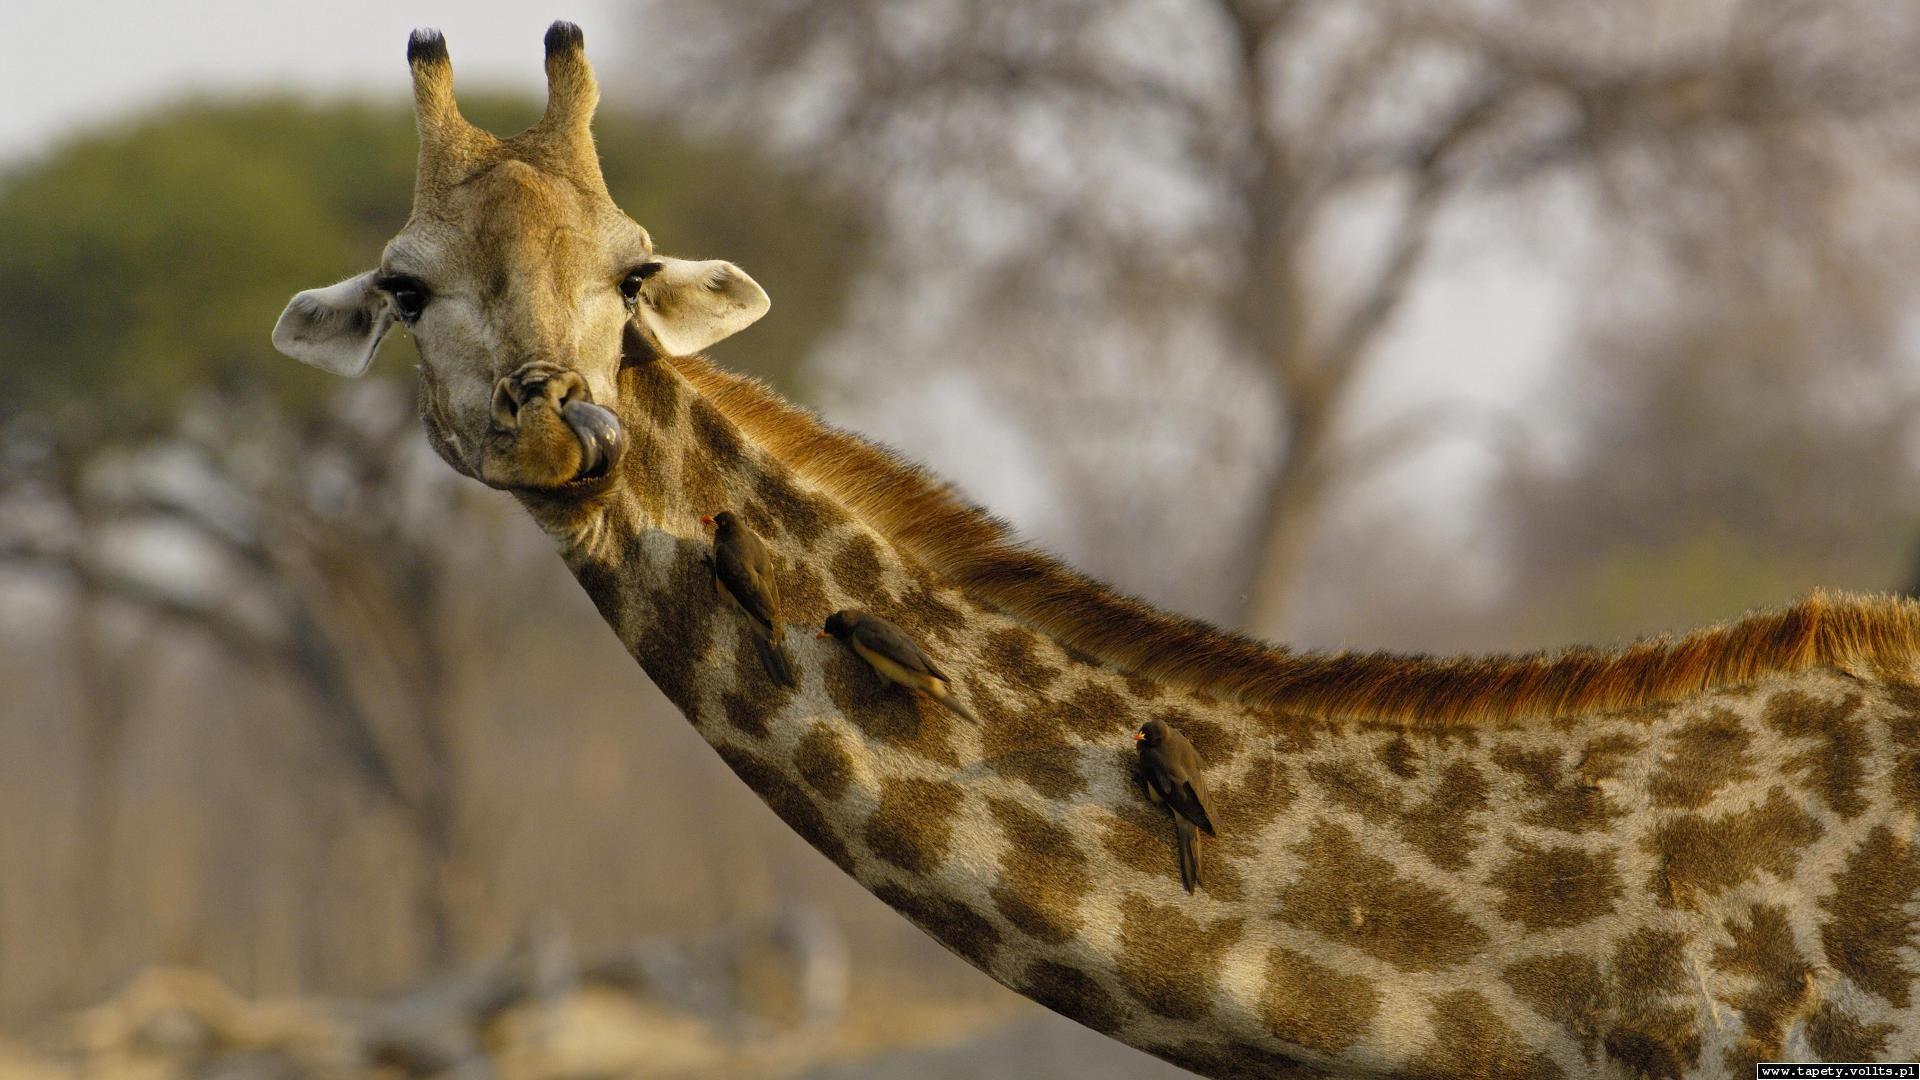 Head Giraffe Photo